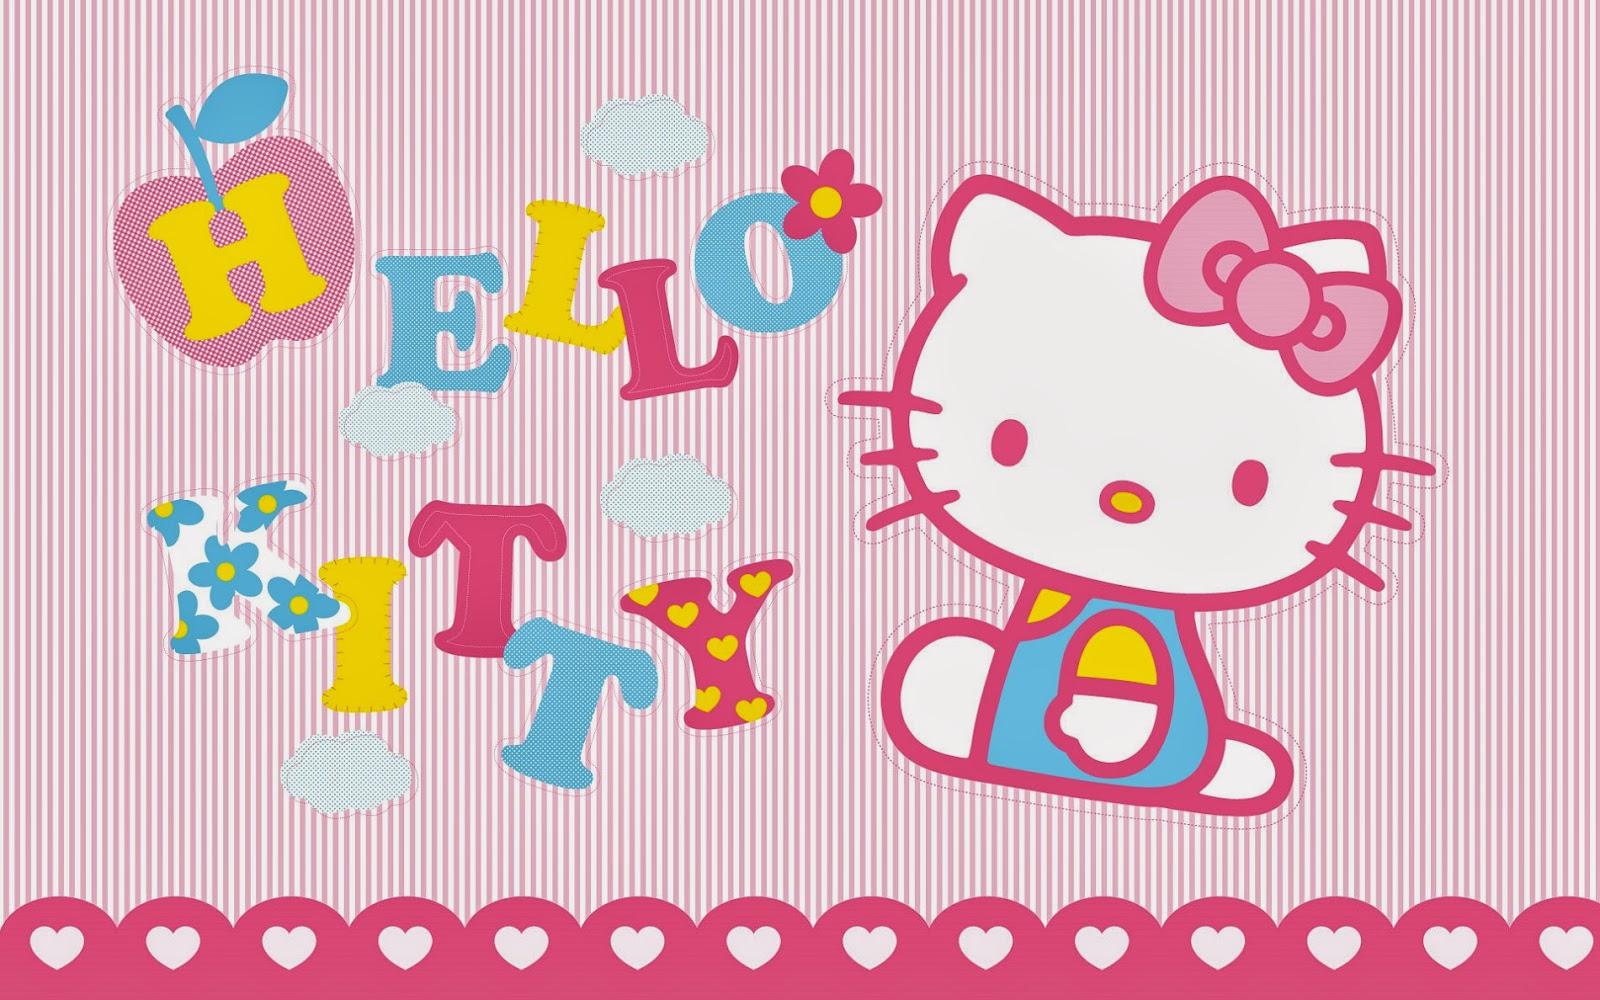 Hello kitty images hello kitty hd wallpaper and background - 20909 Pink Background Hello Kitty Hd Wallpaperz